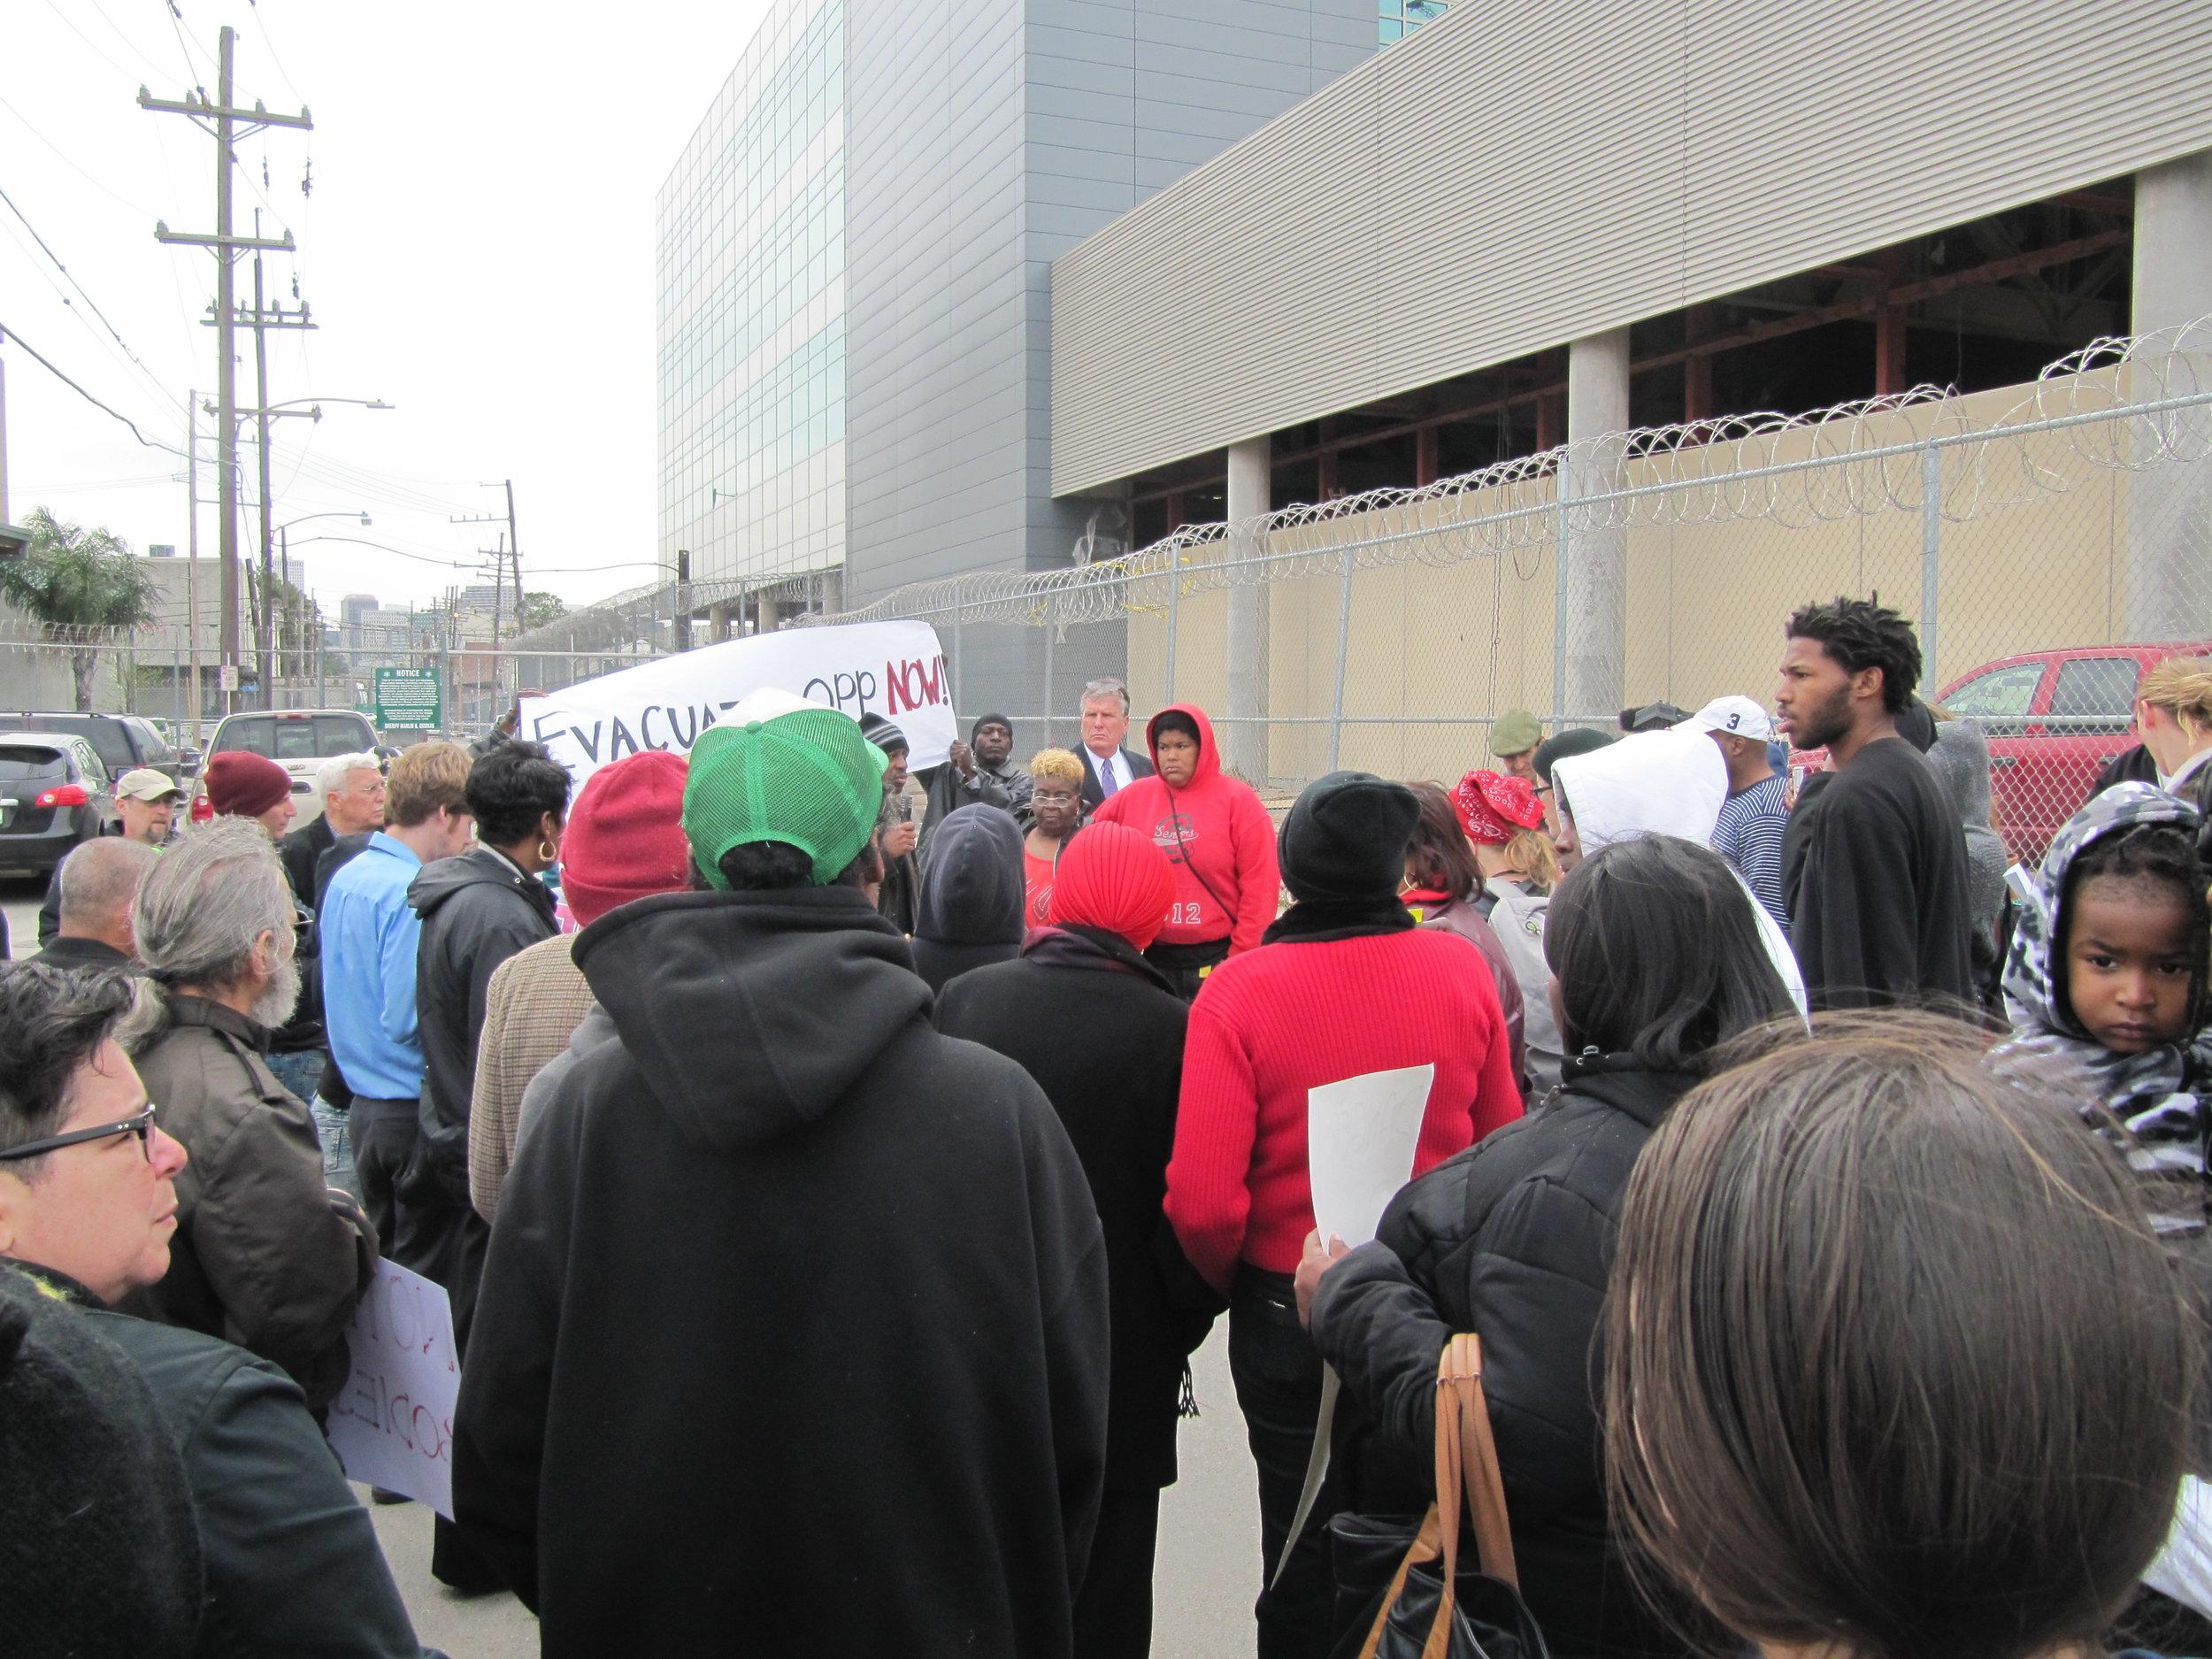 opprc-protest-3-26-14-089-copy.jpg